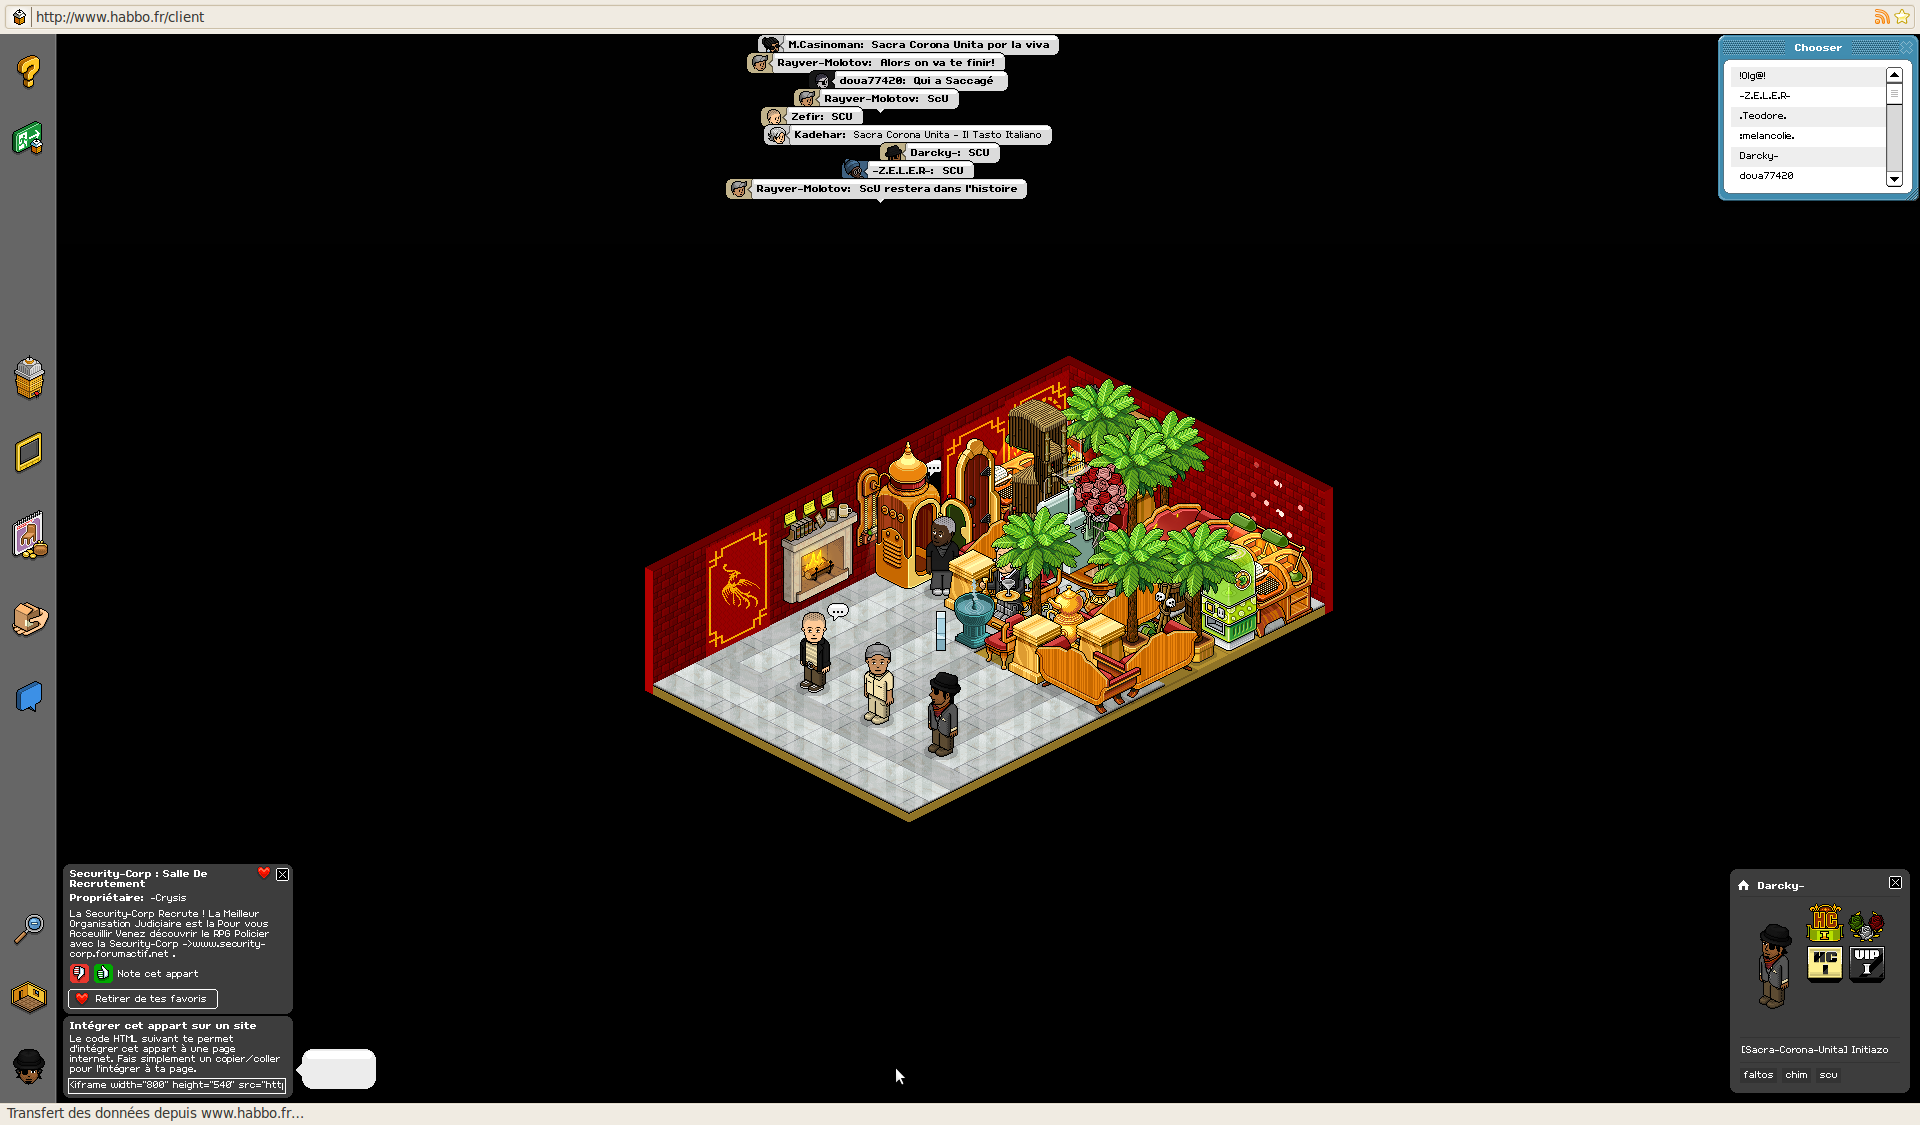 [Darcky] Sécurity Corp : Salle de recrutement + discothèque 361281Capture_Habbo____Mozilla_Firefox_5